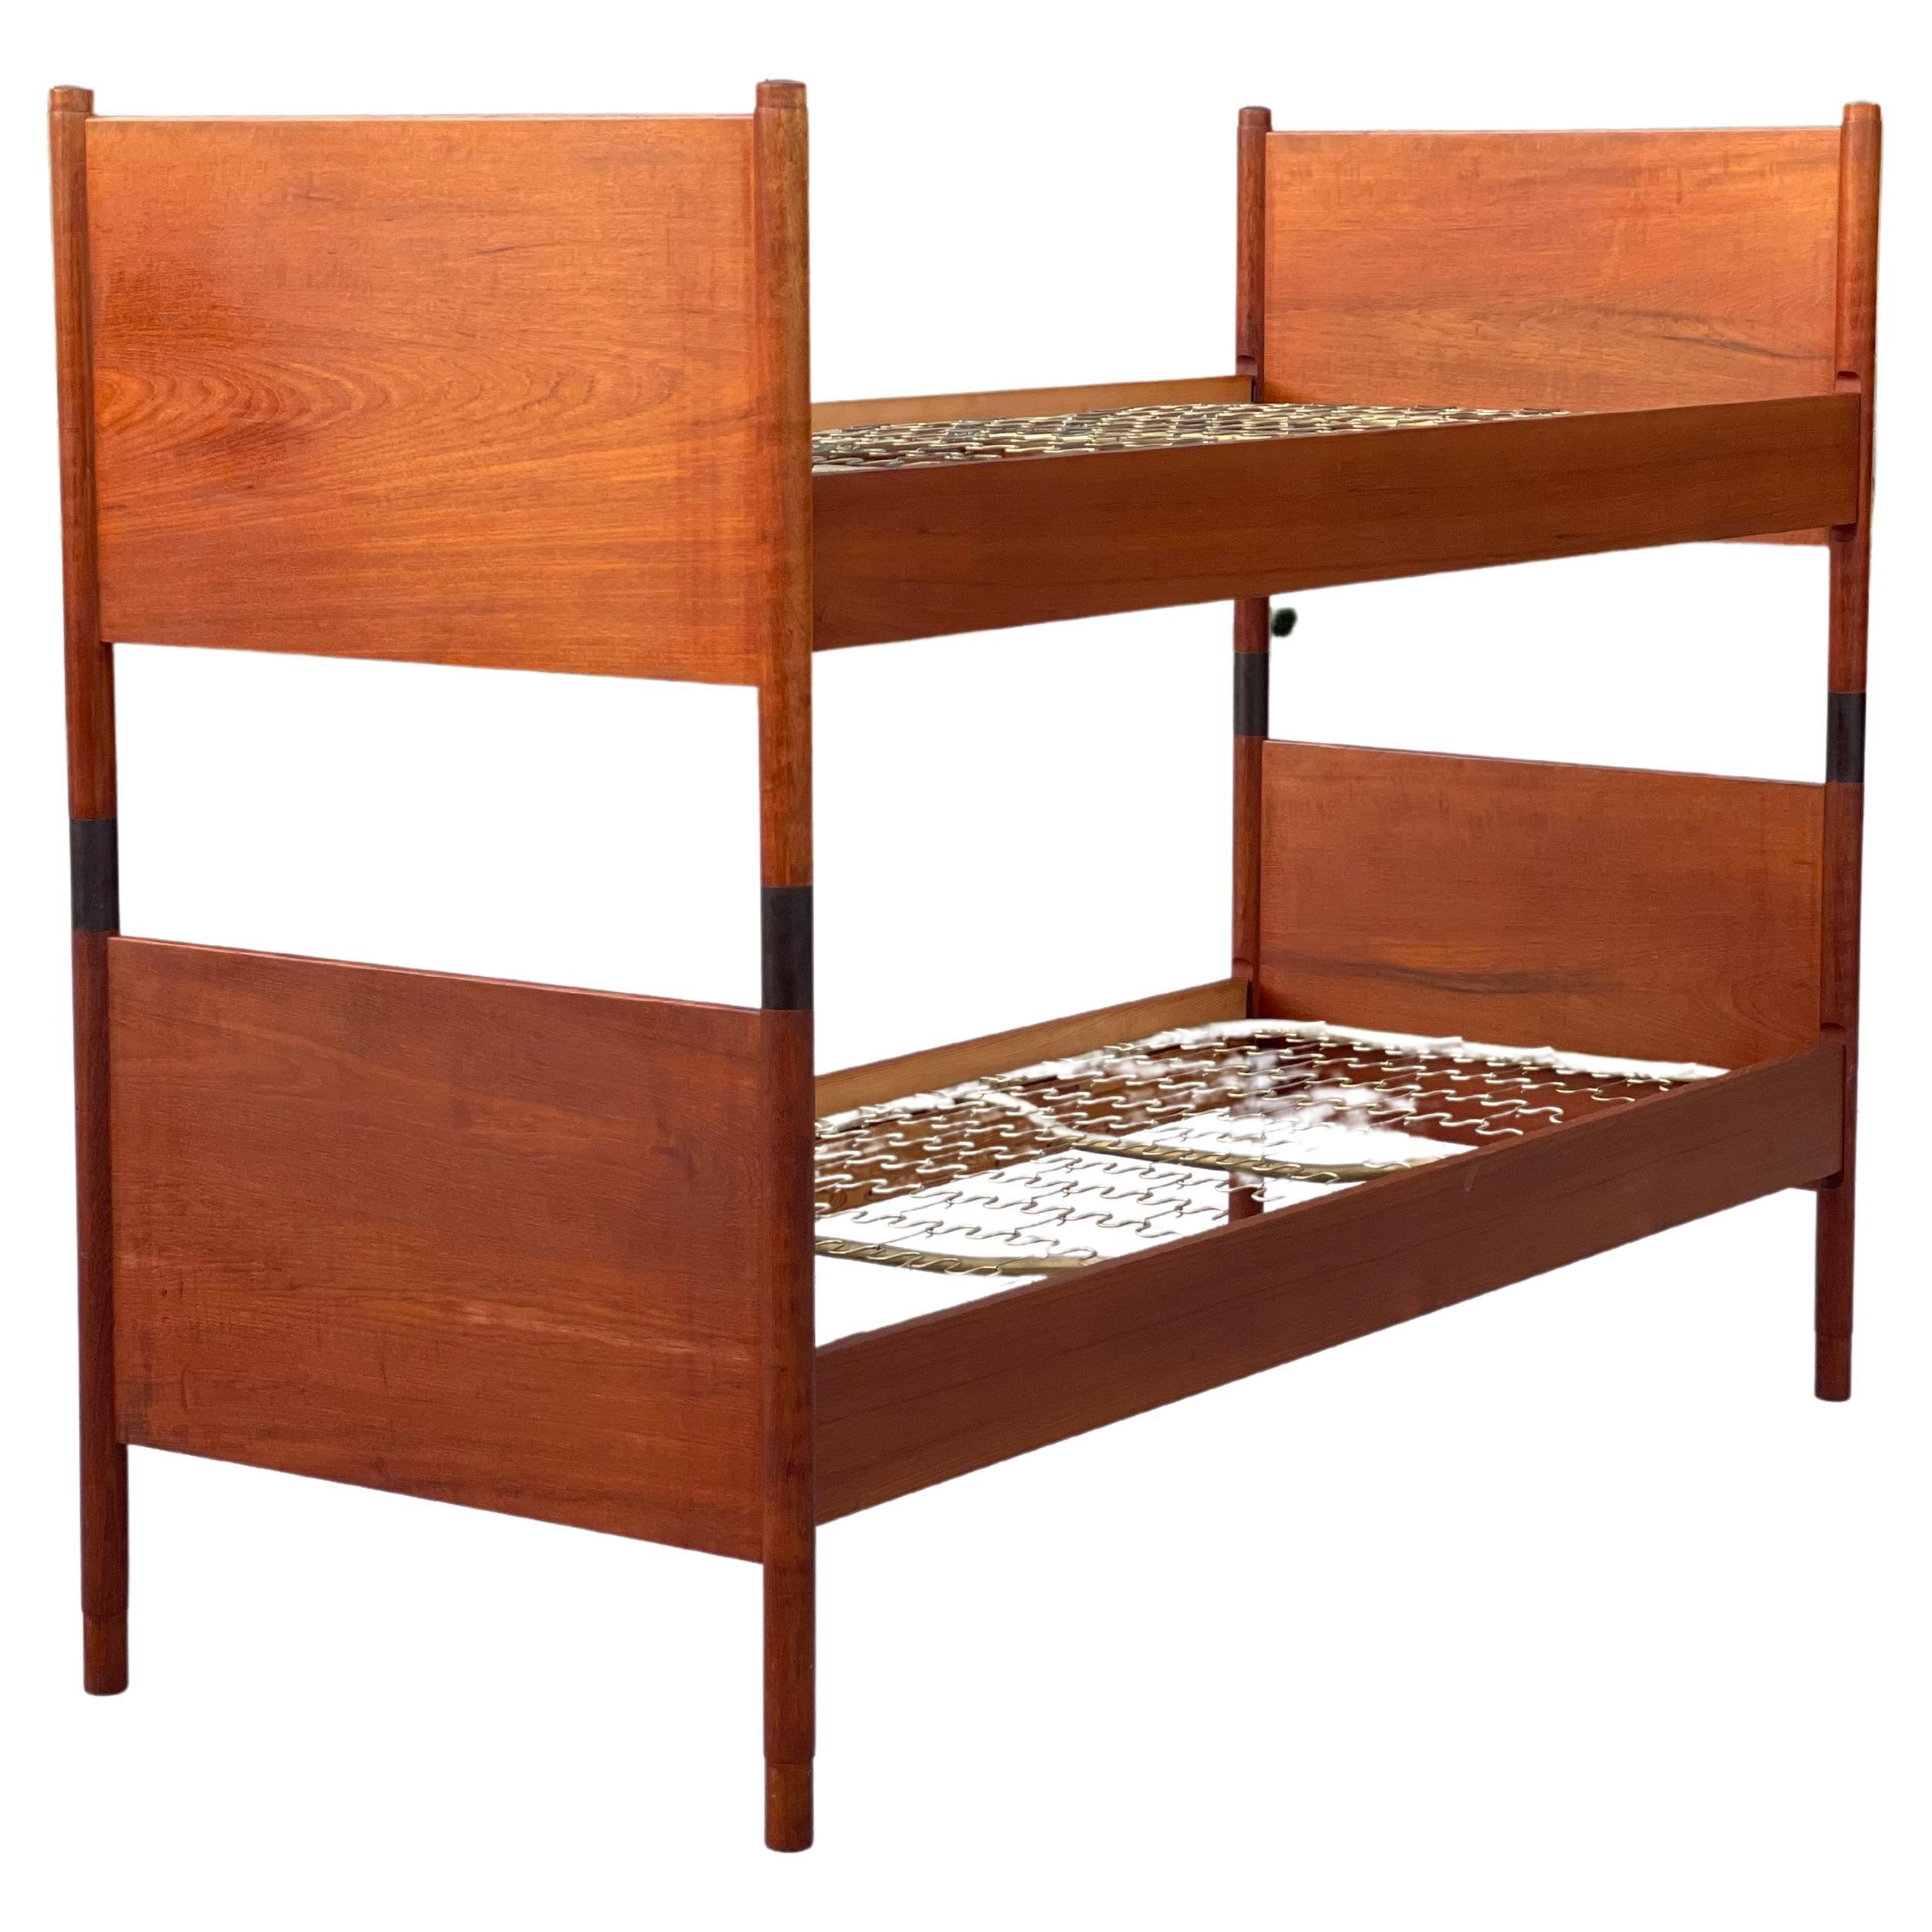 Rare Danish Modern Petite Bunk Beds by Borge Mogensen in Teak